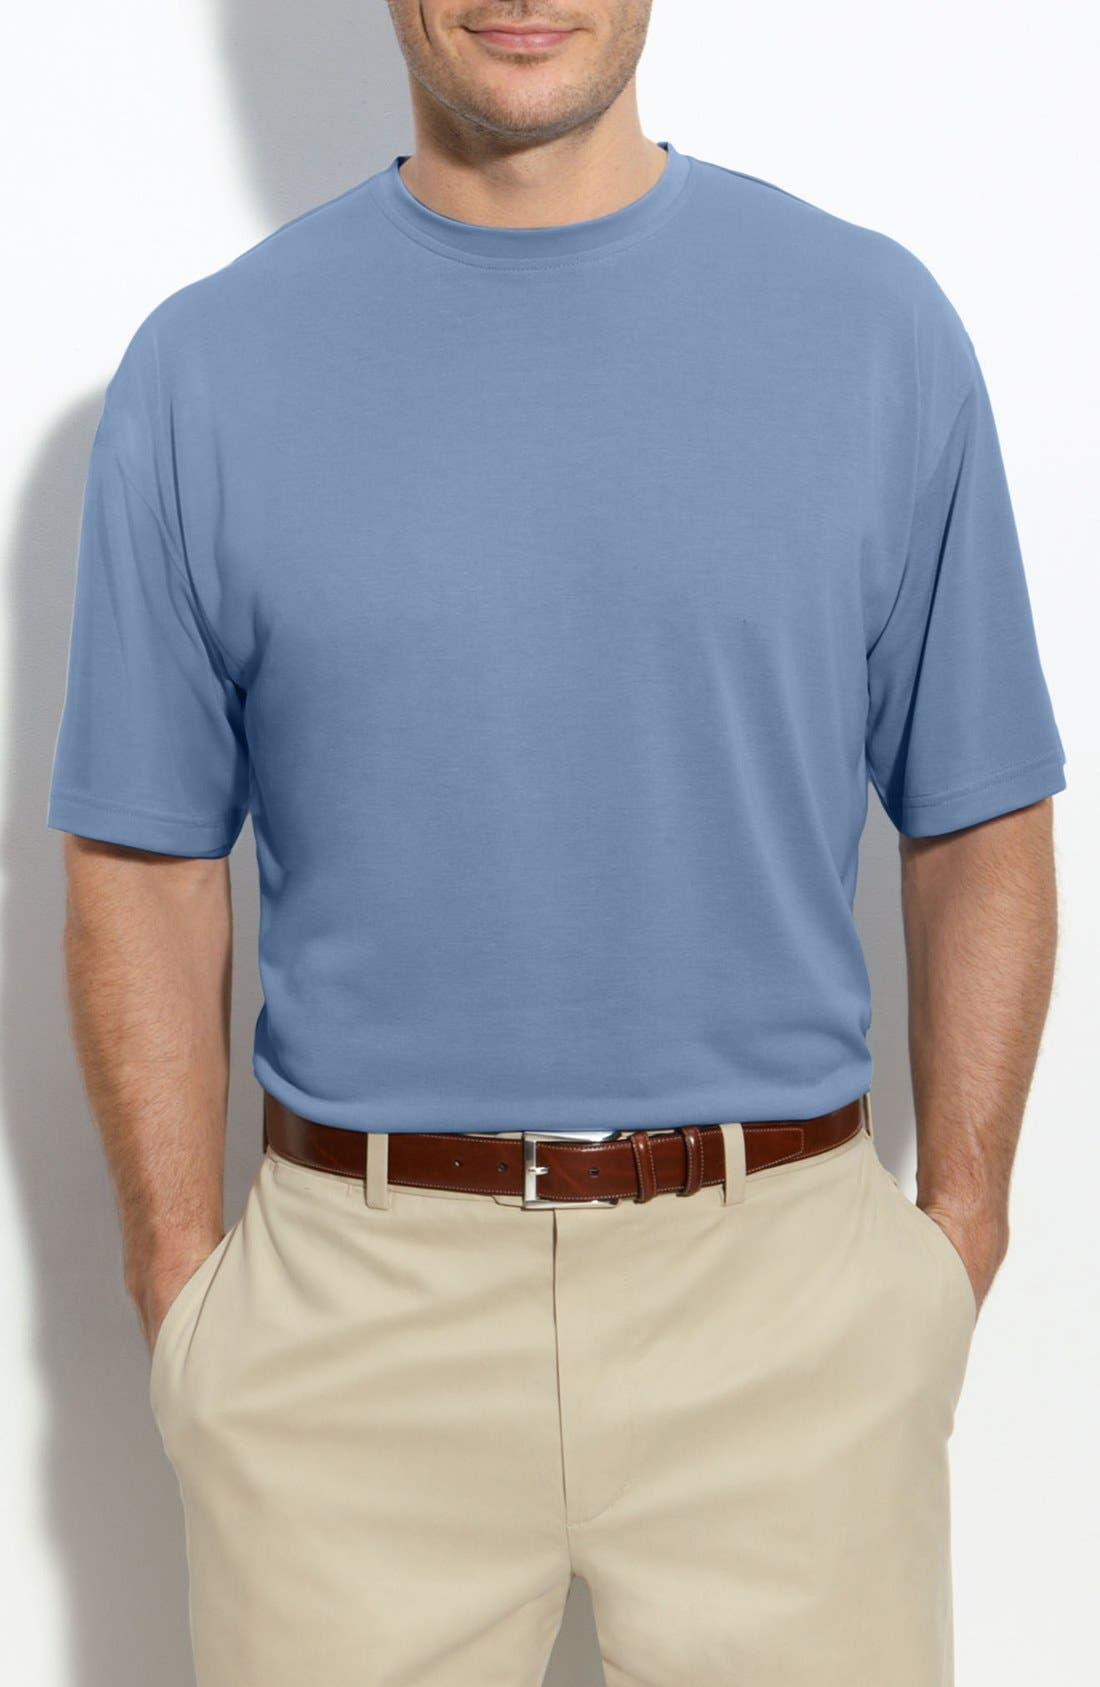 Alternate Image 1 Selected - Burma Bibas Polynosic Knit T-Shirt